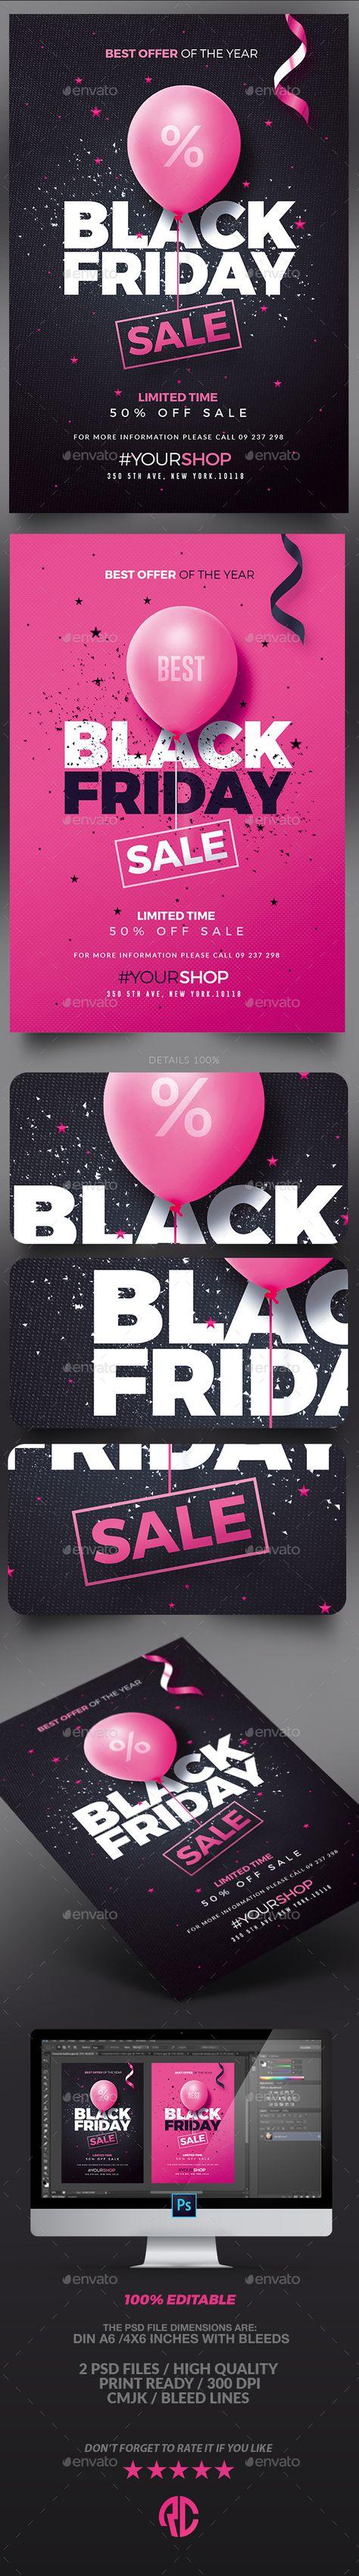 Black Friday | Flyer Template PSD